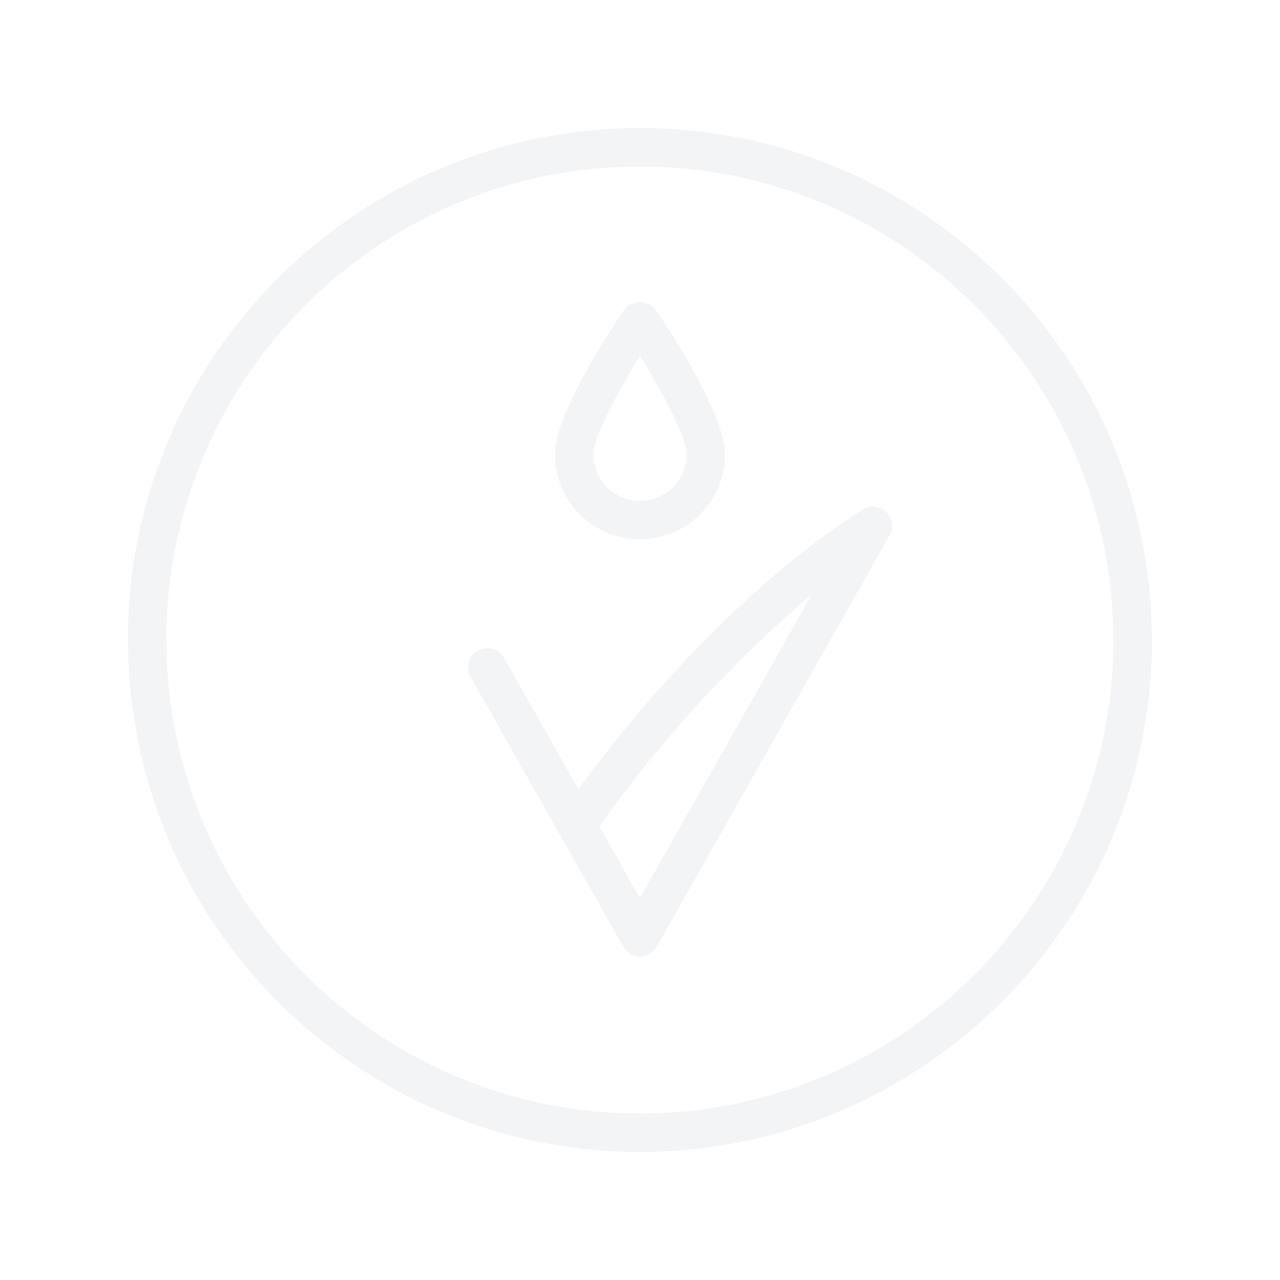 JANE IREDALE PurePressed Trio Eyeshadow 2.8g